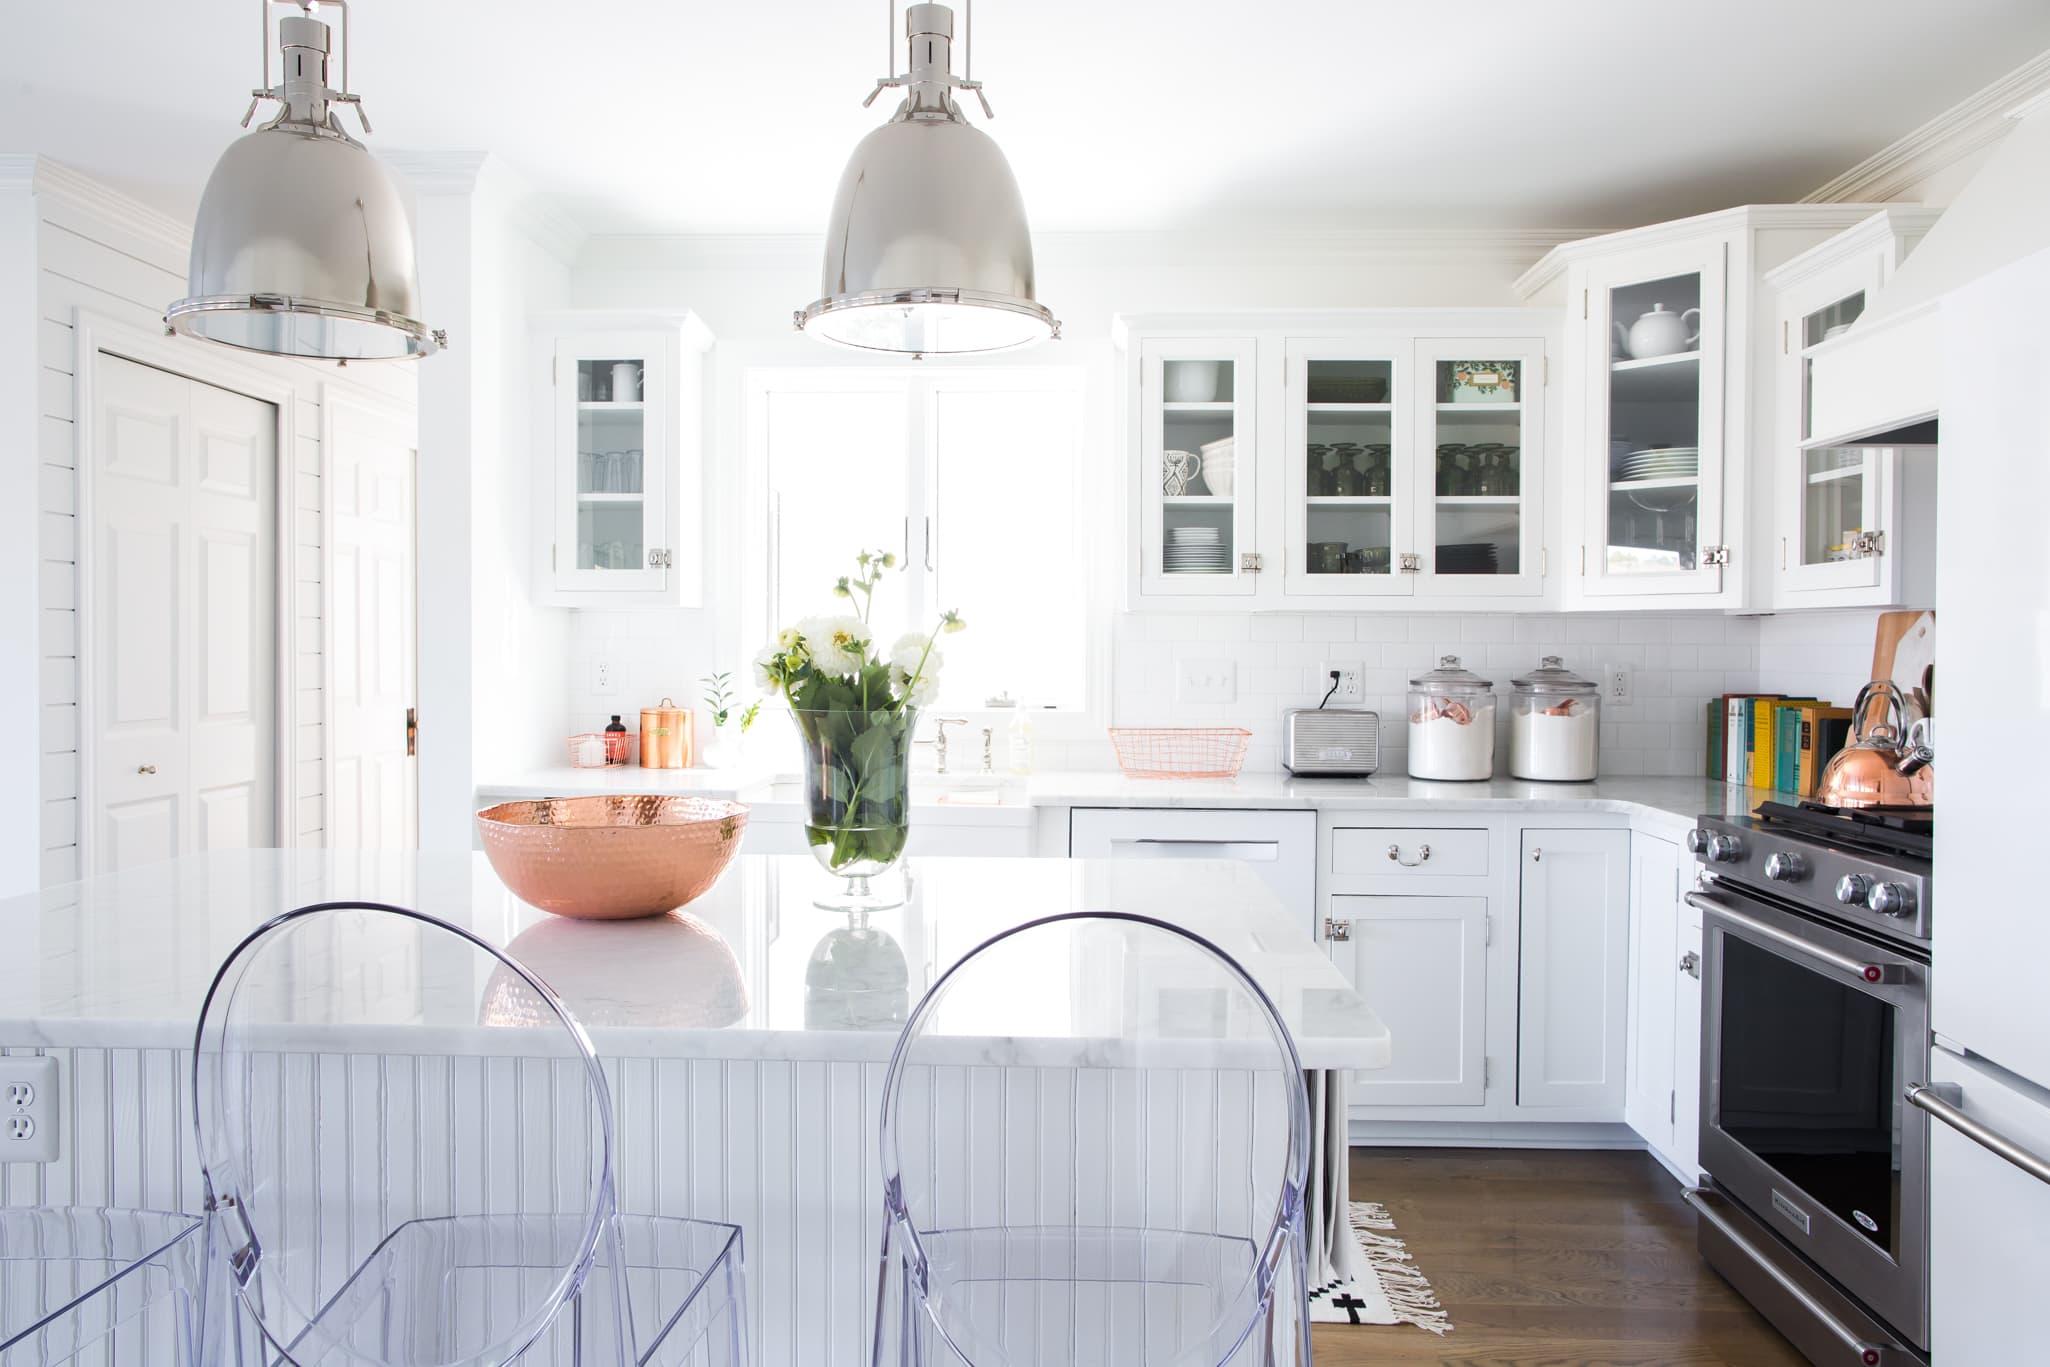 Glass Front Kitchen Cabinet Doors Arenu0027t Just Beautiful